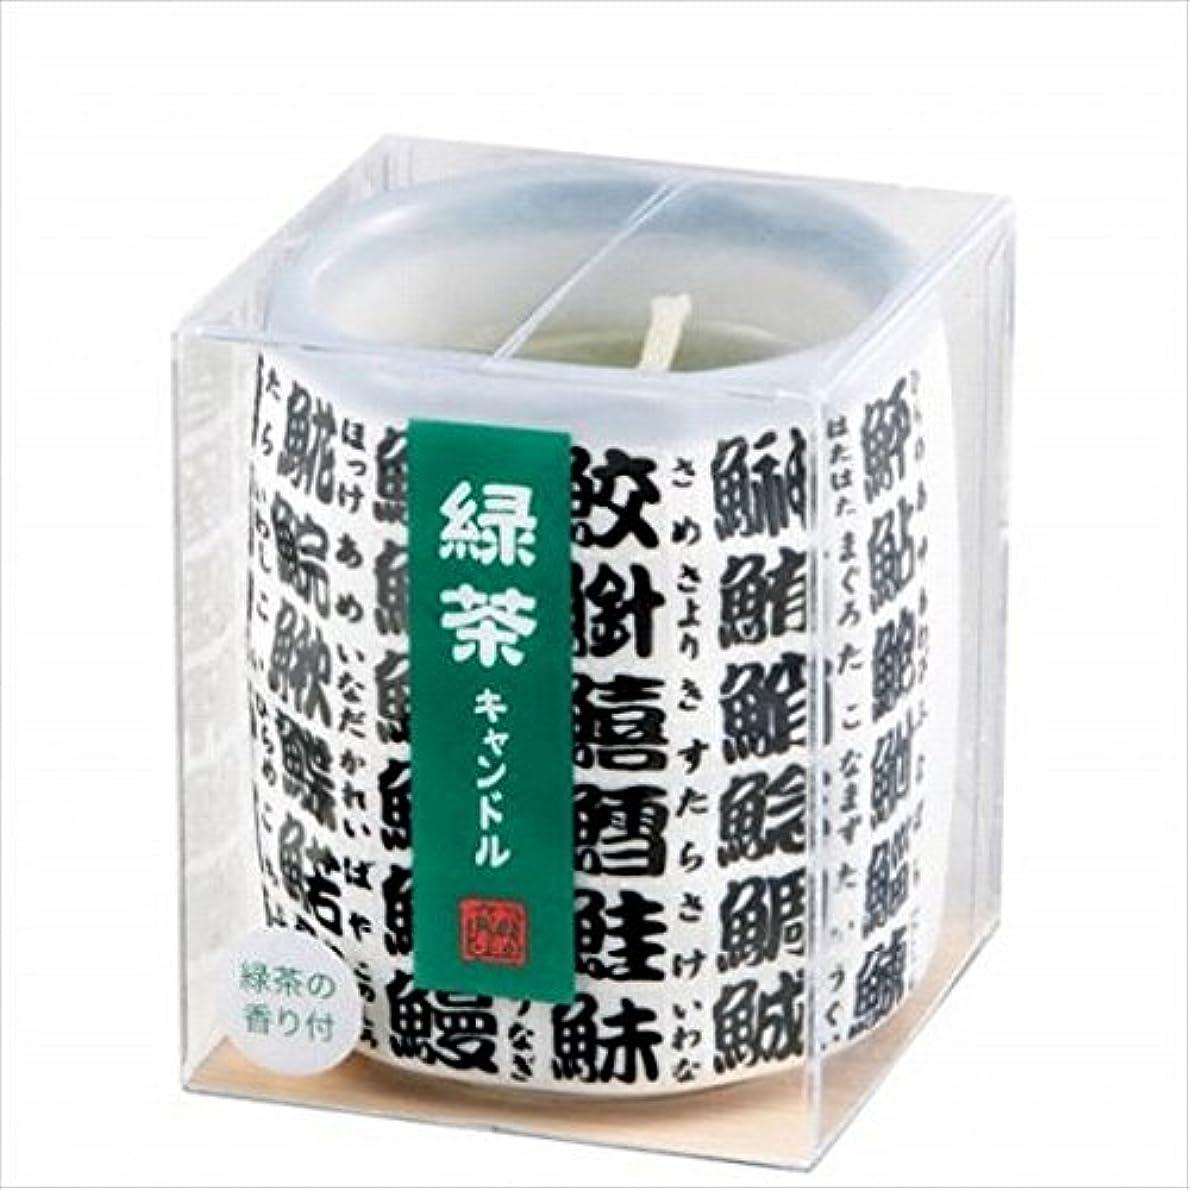 kameyama candle(カメヤマキャンドル) 緑茶キャンドル(小)(86070010)